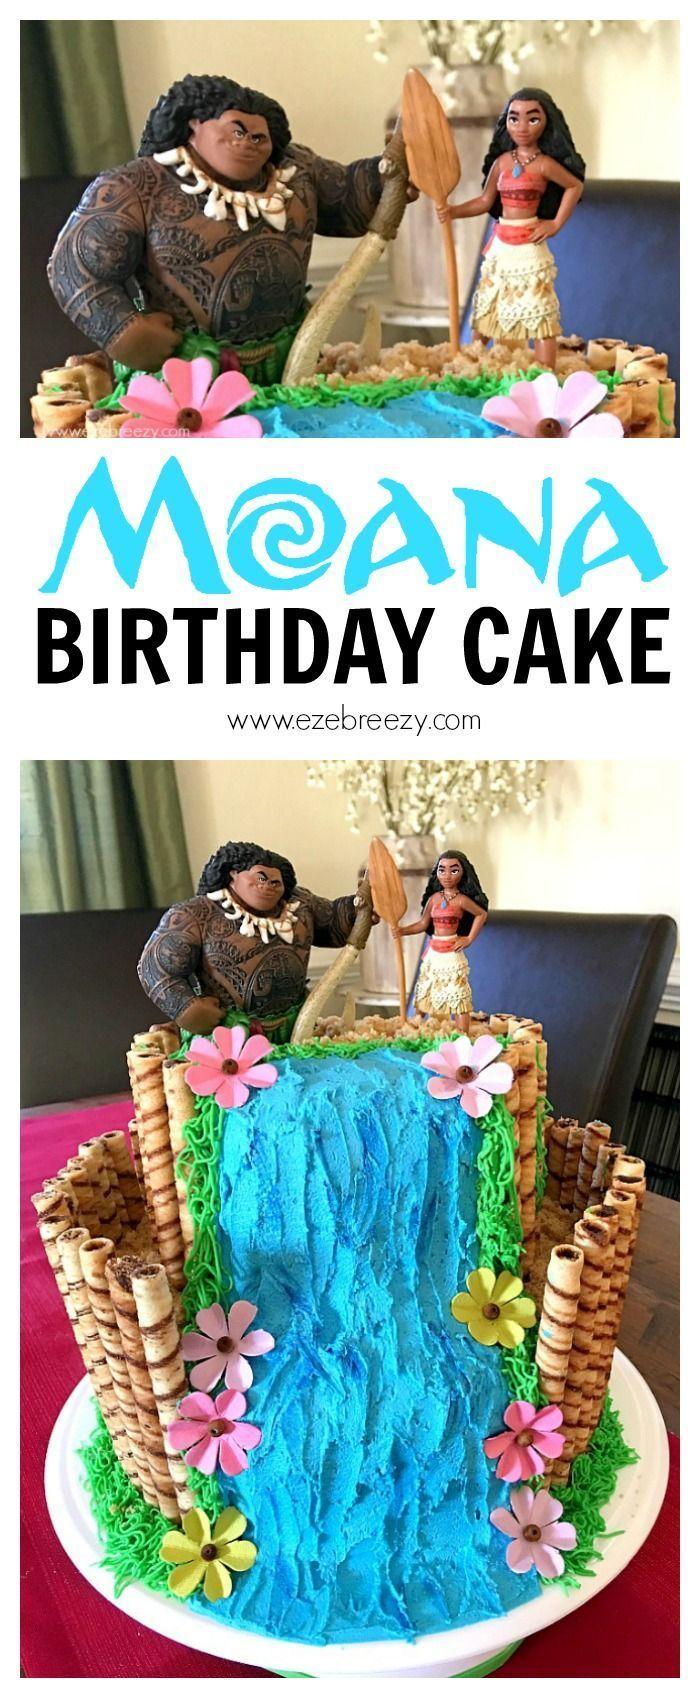 Pleasing 100 Rihanna Song Birthday Cake Rihanna Radio Listen To Free Birthday Cards Printable Benkemecafe Filternl